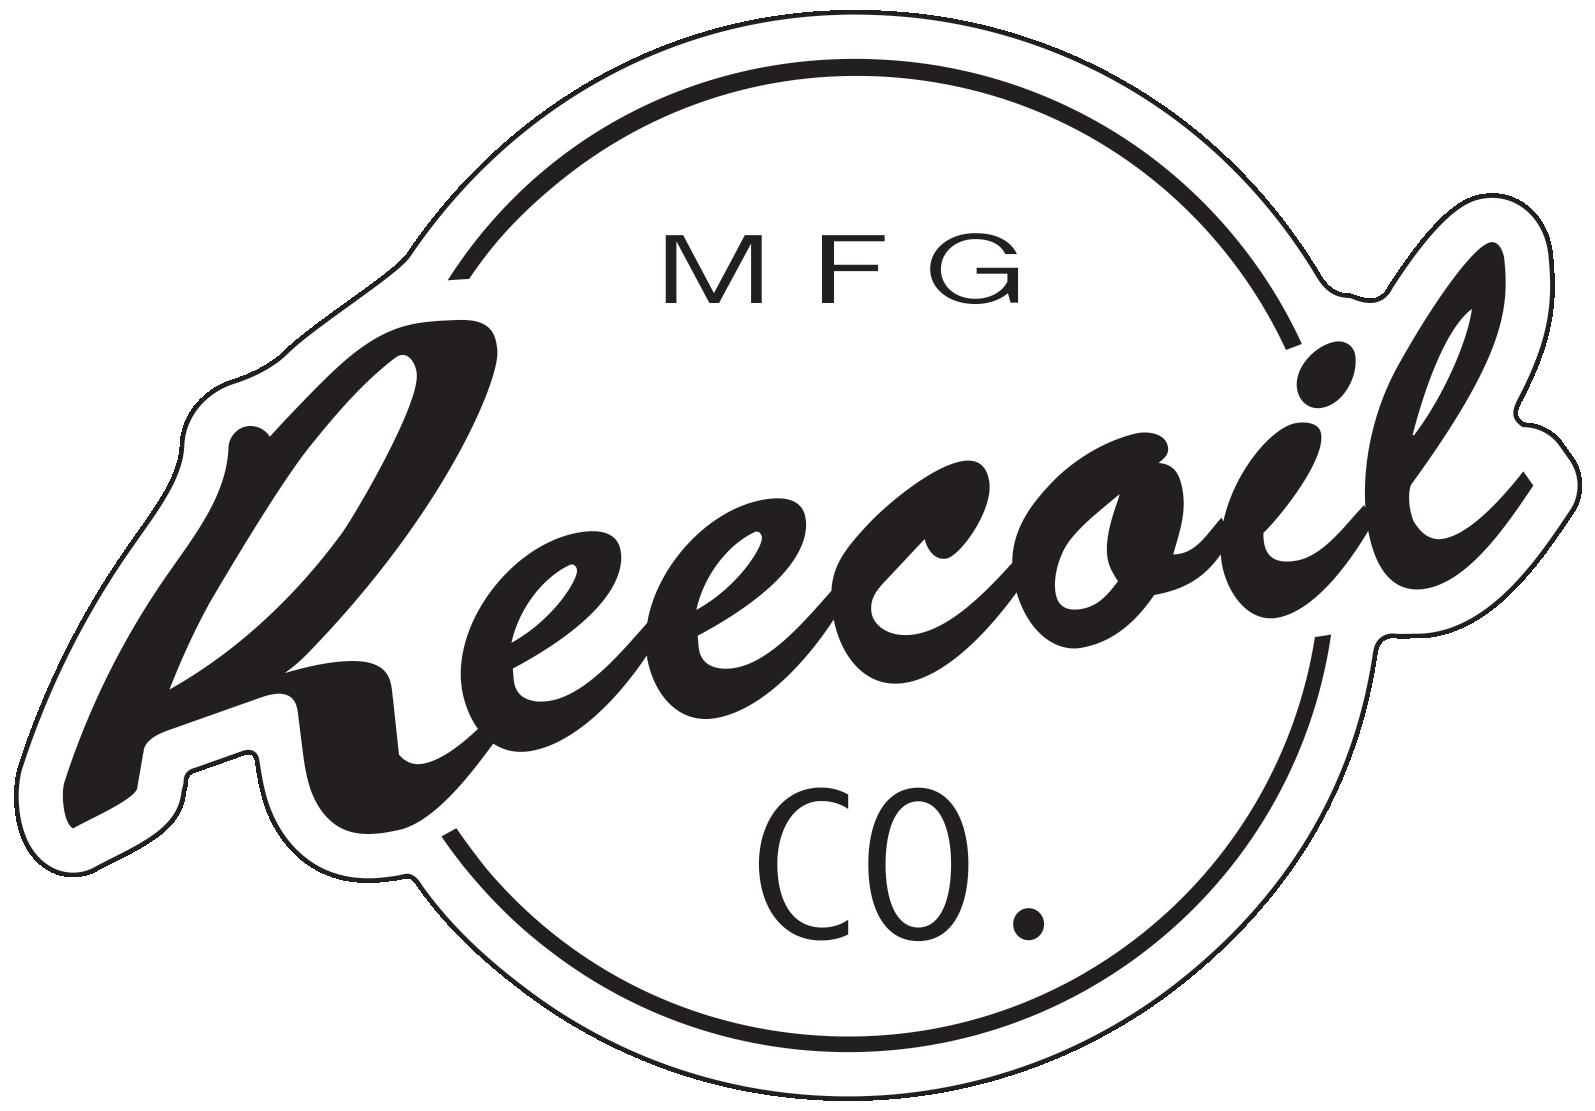 Reecoil Logo